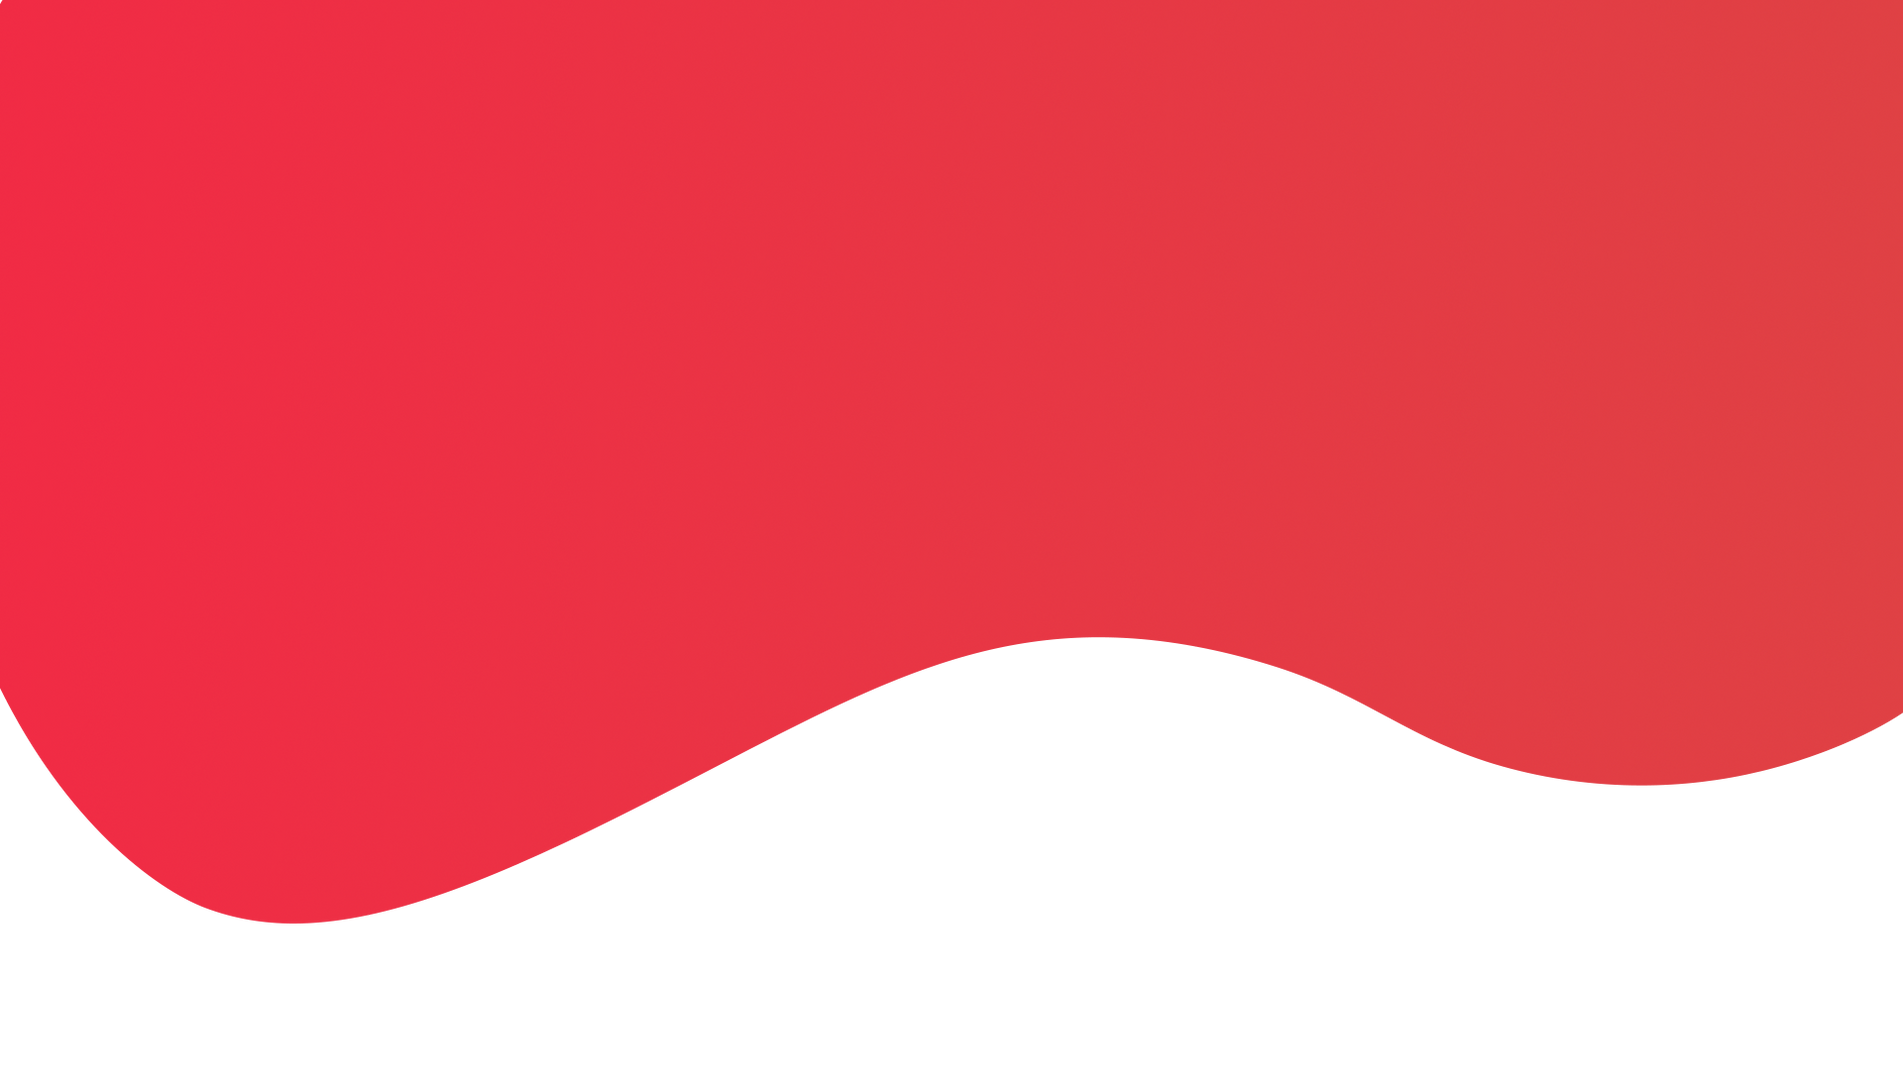 bannergrande.png